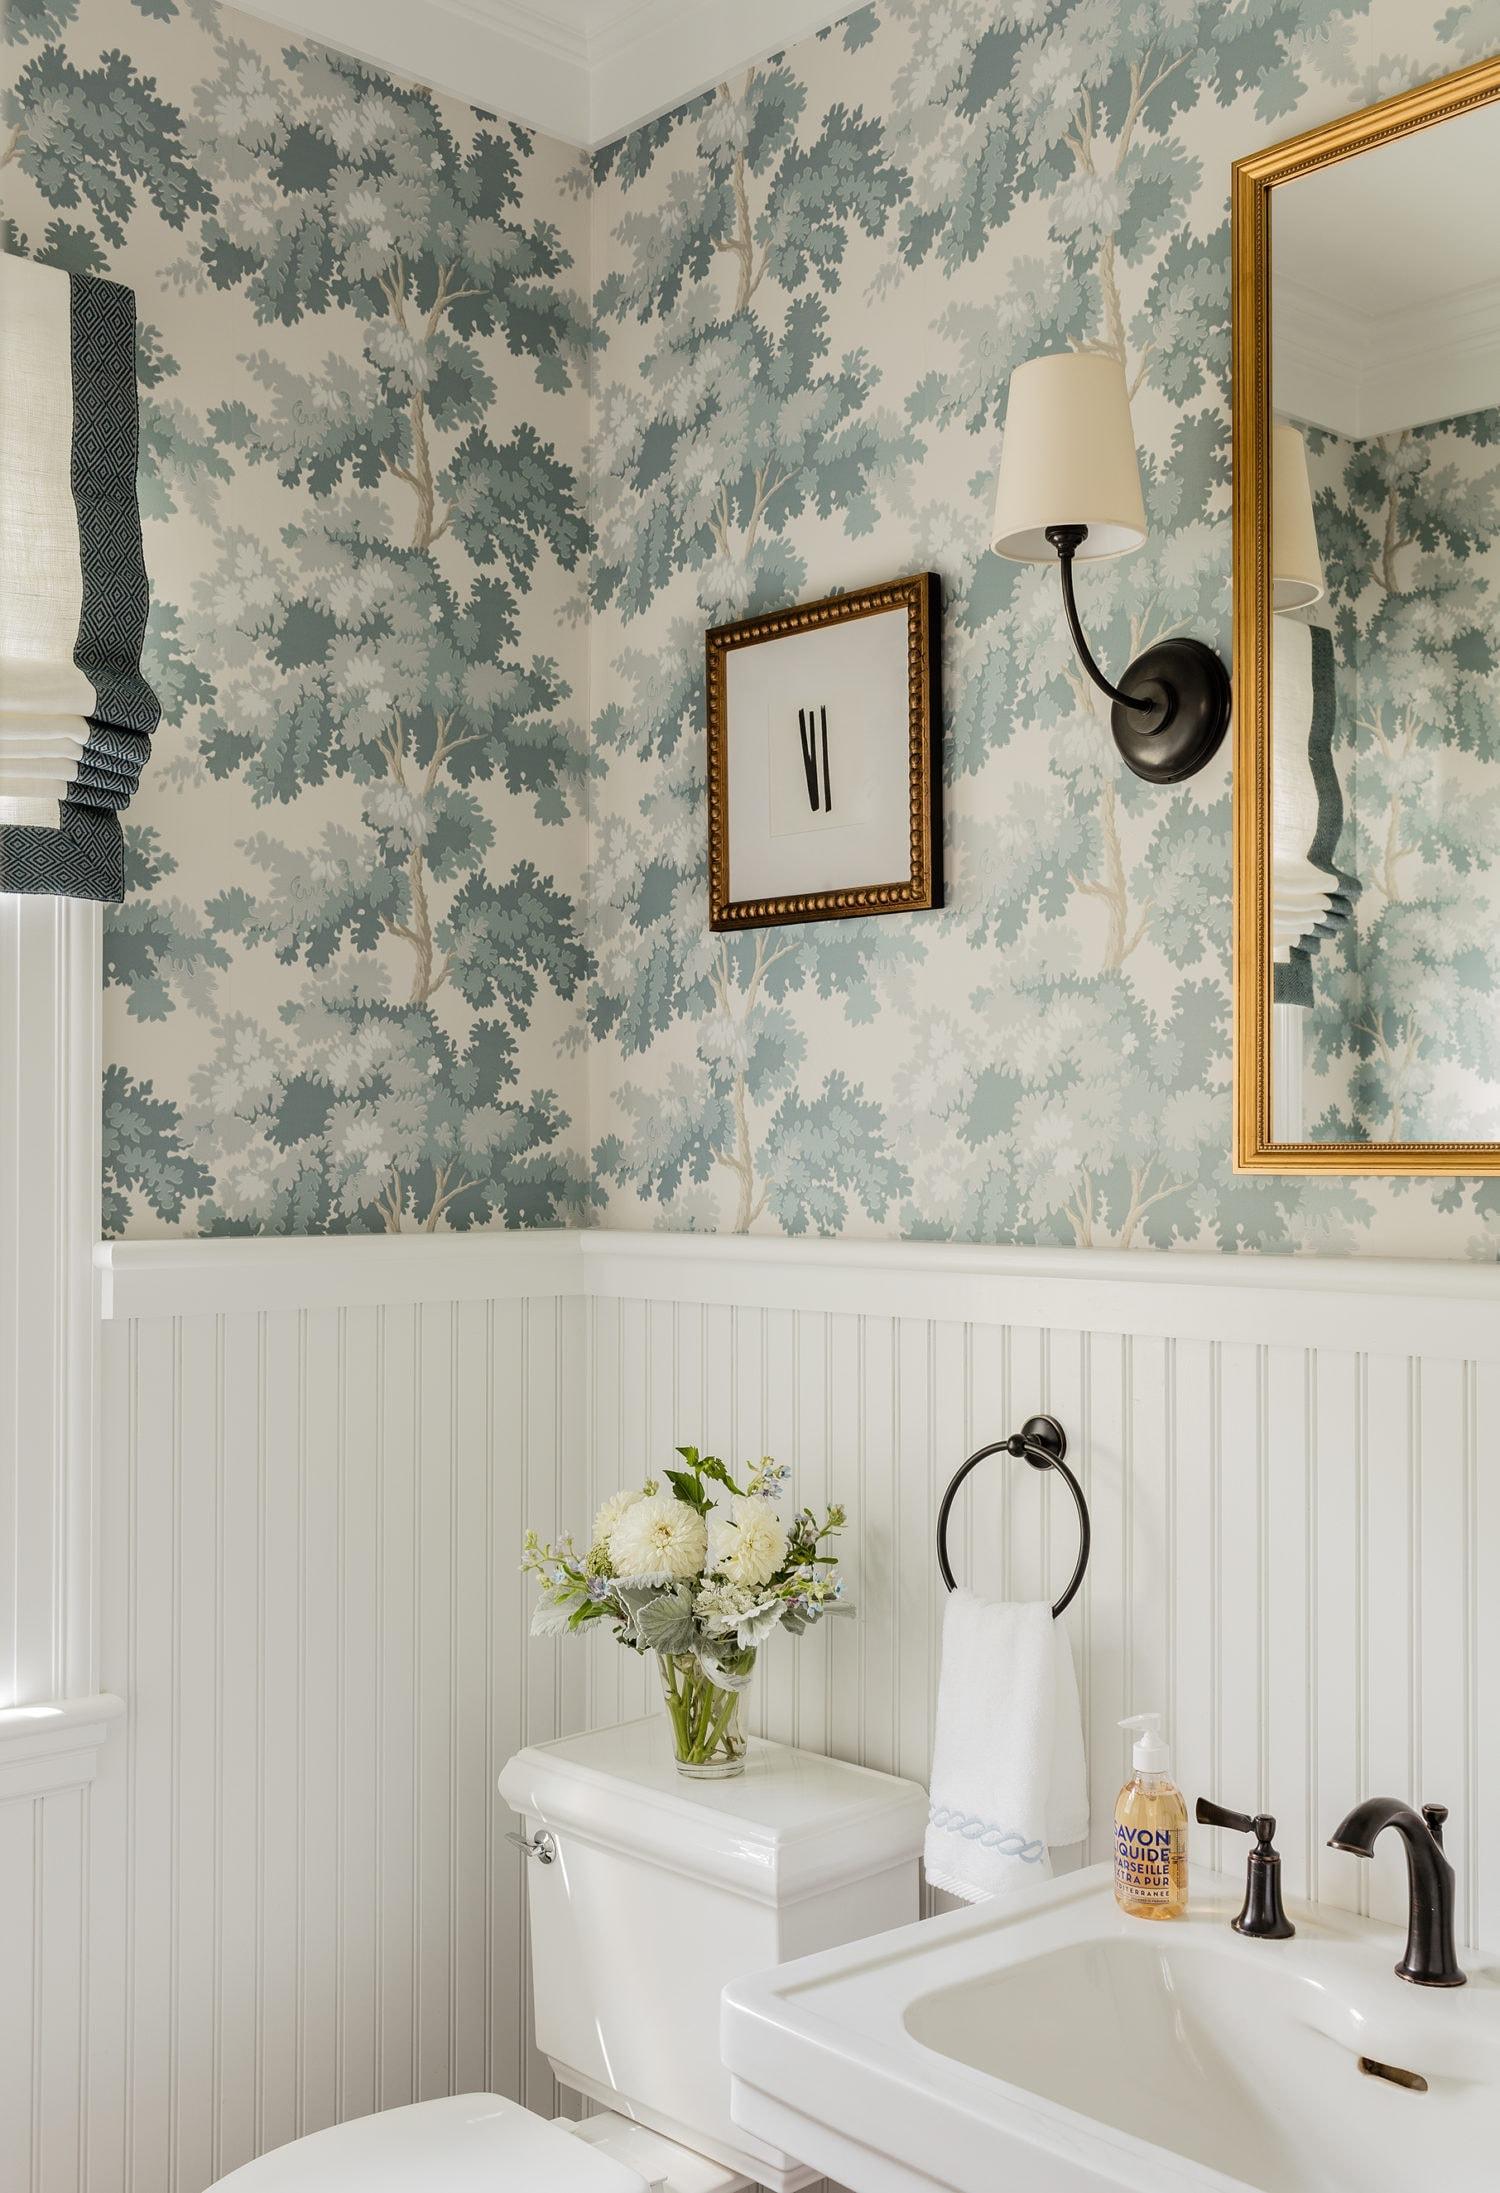 sandberg-raphael-wallpaper